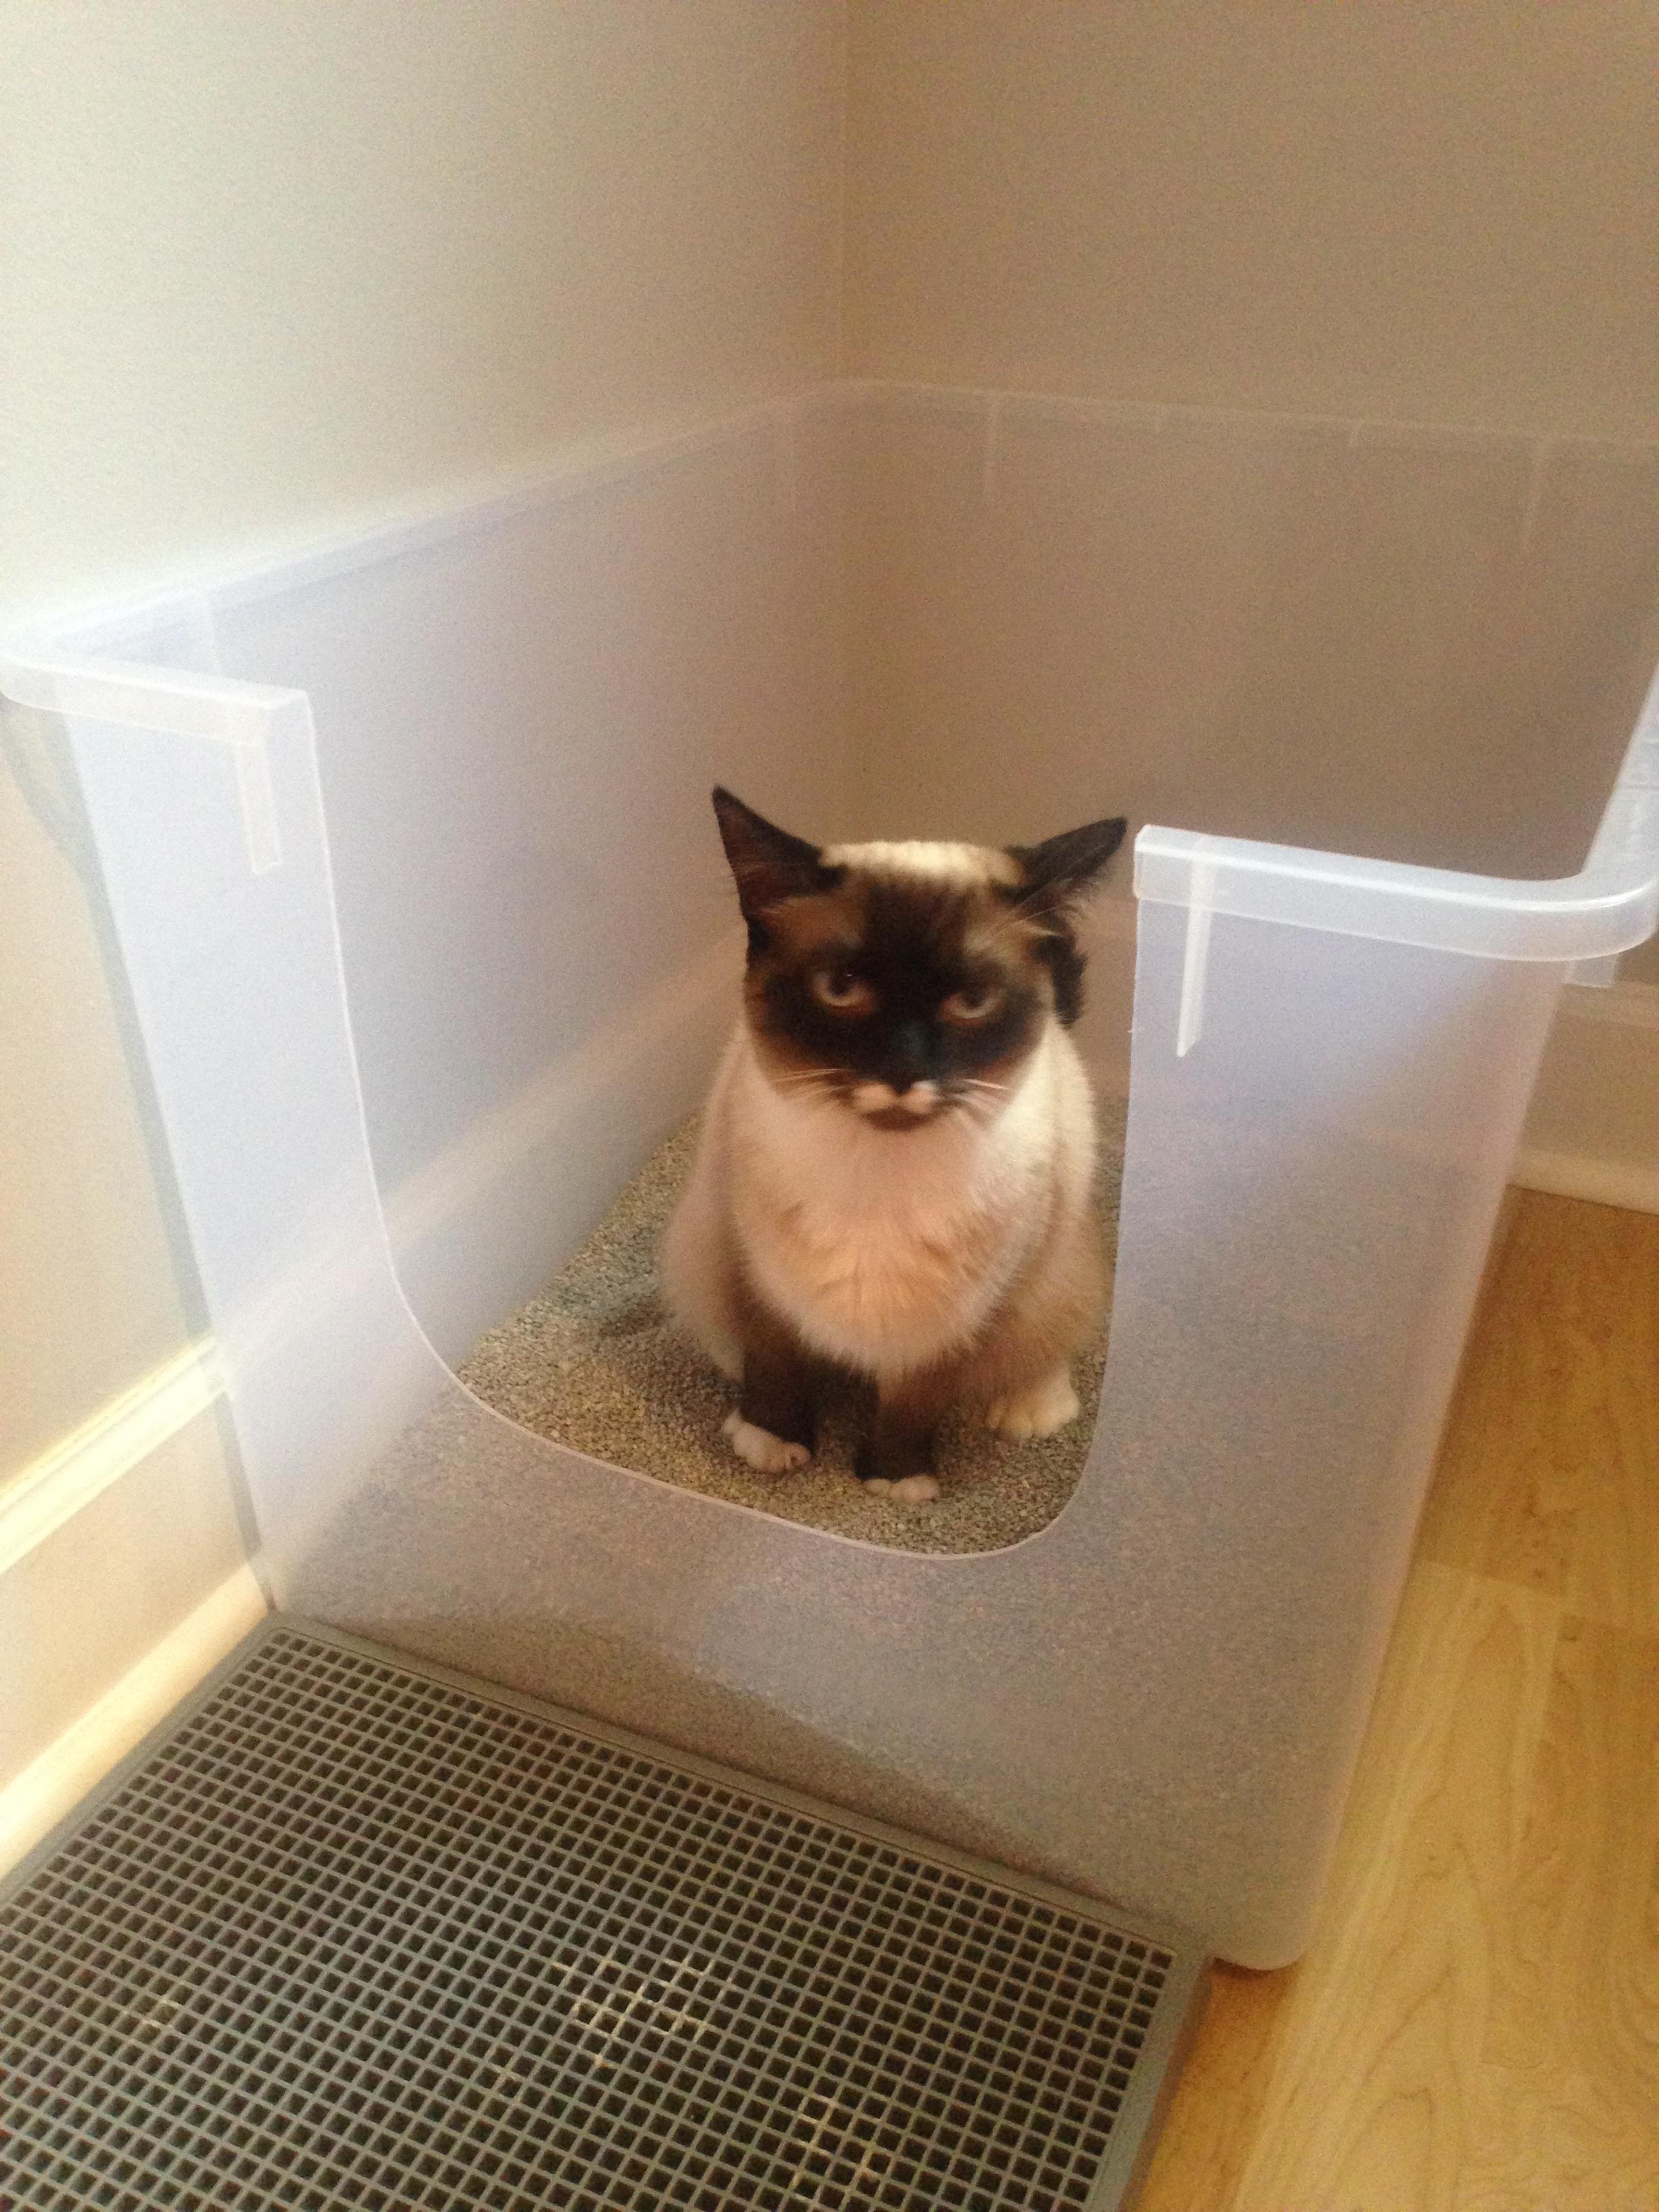 constipation in cats fundamentally feline rh fundamentallyfeline com Functional Megacolon Treatment for Megacolon in Cats